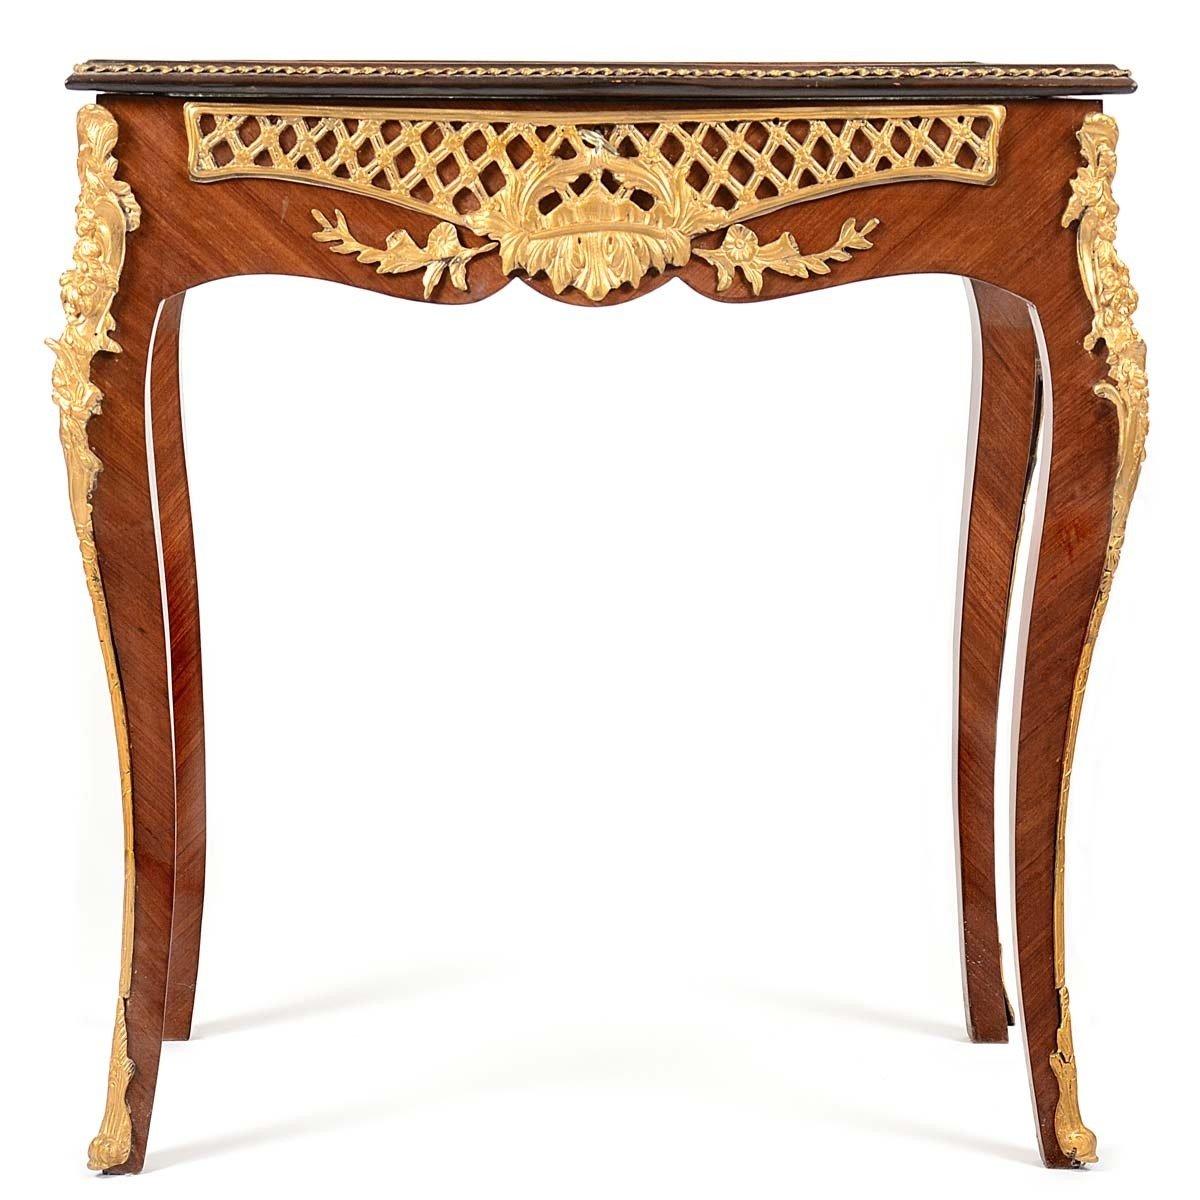 Tisch - Stil Barock | Rokkoko | Louis XV/ XVI | Handgefertigt |